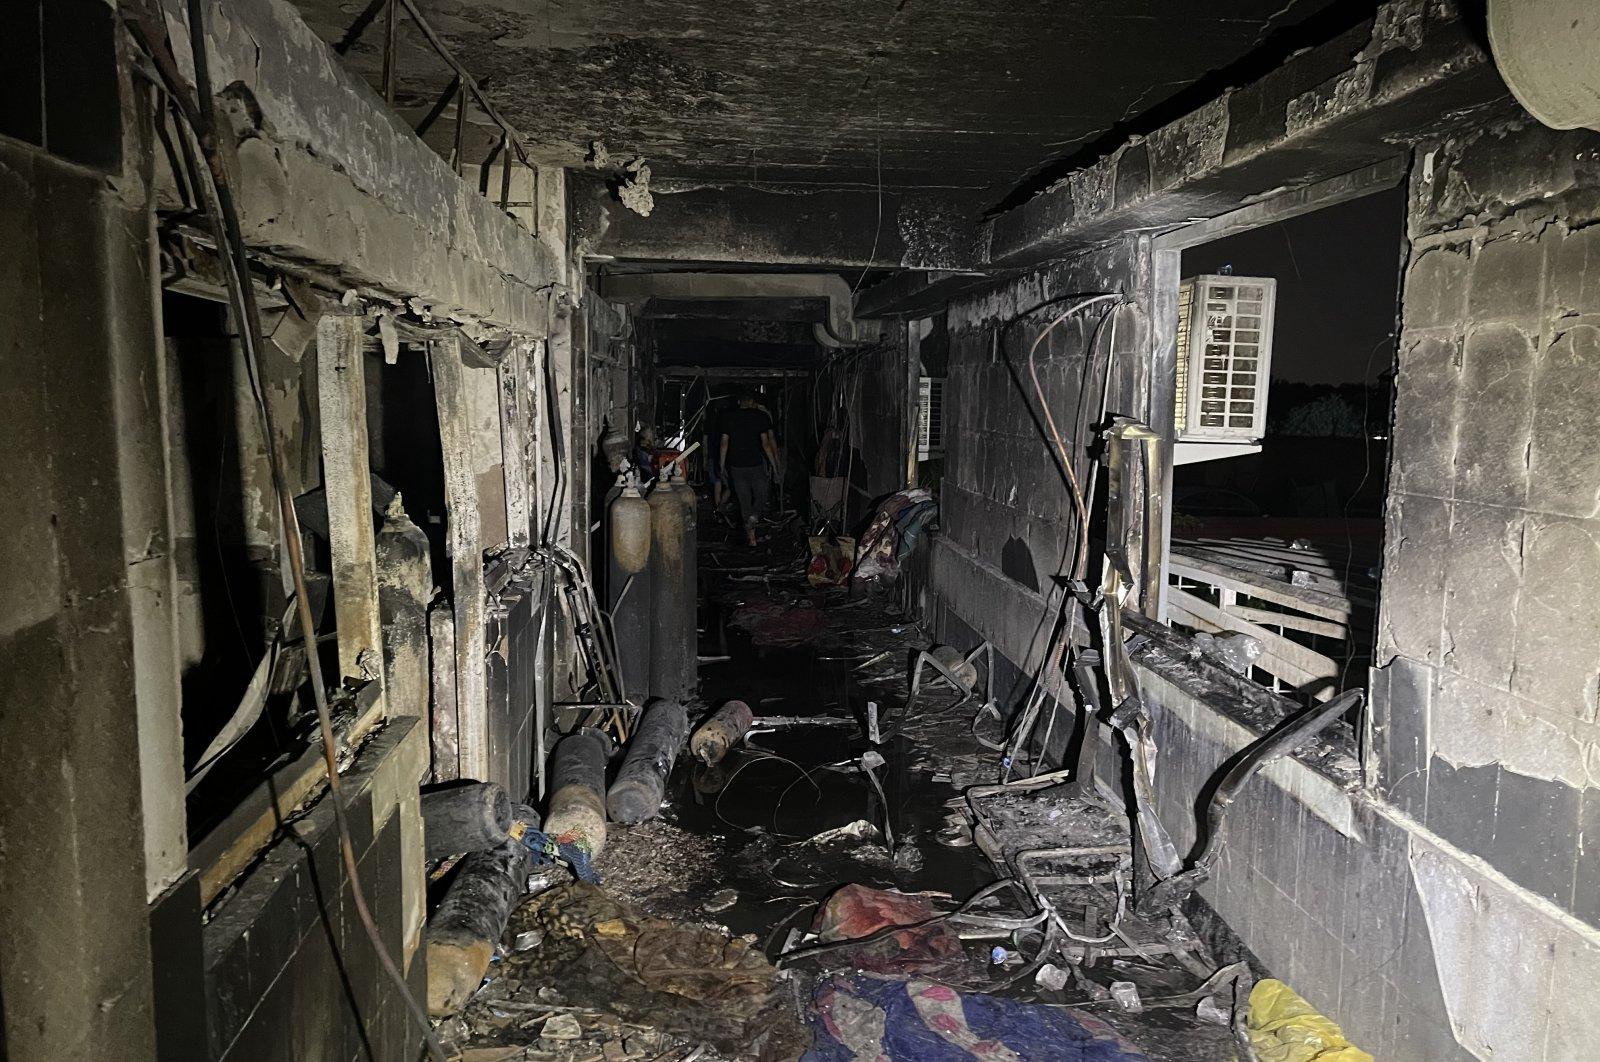 The aftermath of a fire at Ibn al-Khatib Hospital, south of Baghdad, Iraq, April 25, 2021. (EPA Photo)